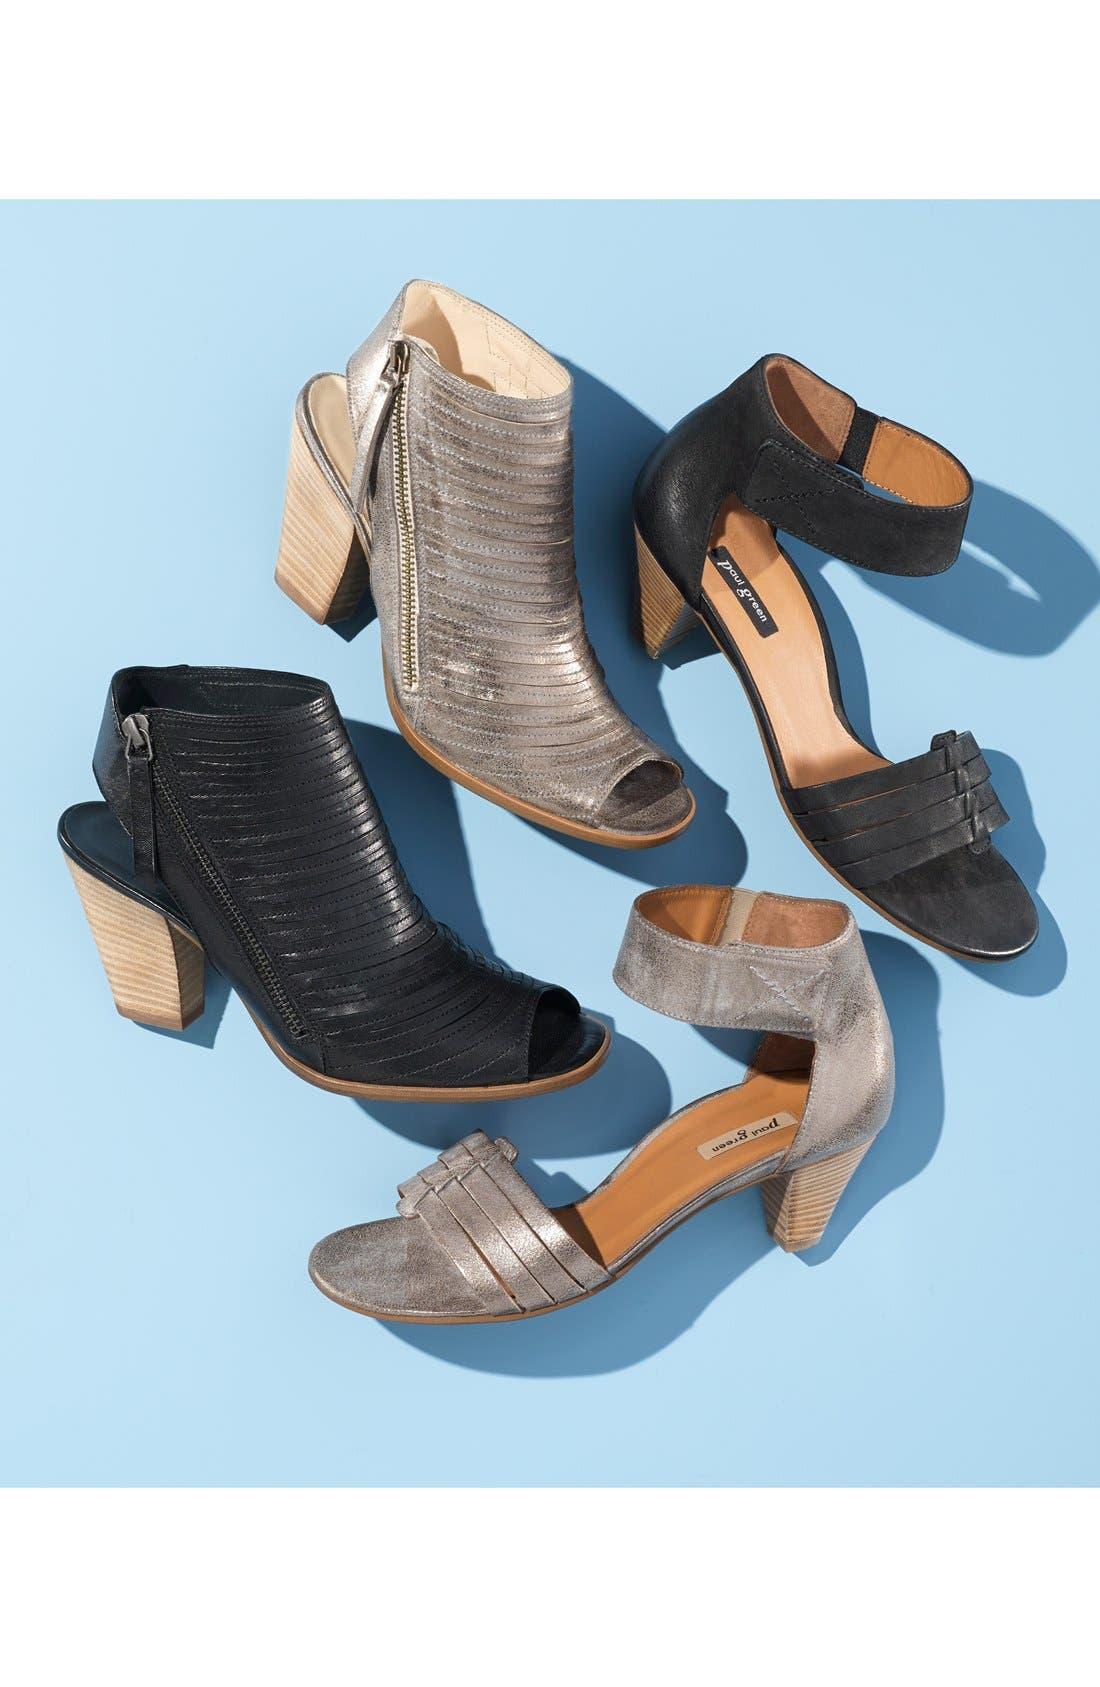 'Cayanne' Leather Peep Toe Sandal,                             Alternate thumbnail 7, color,                             006